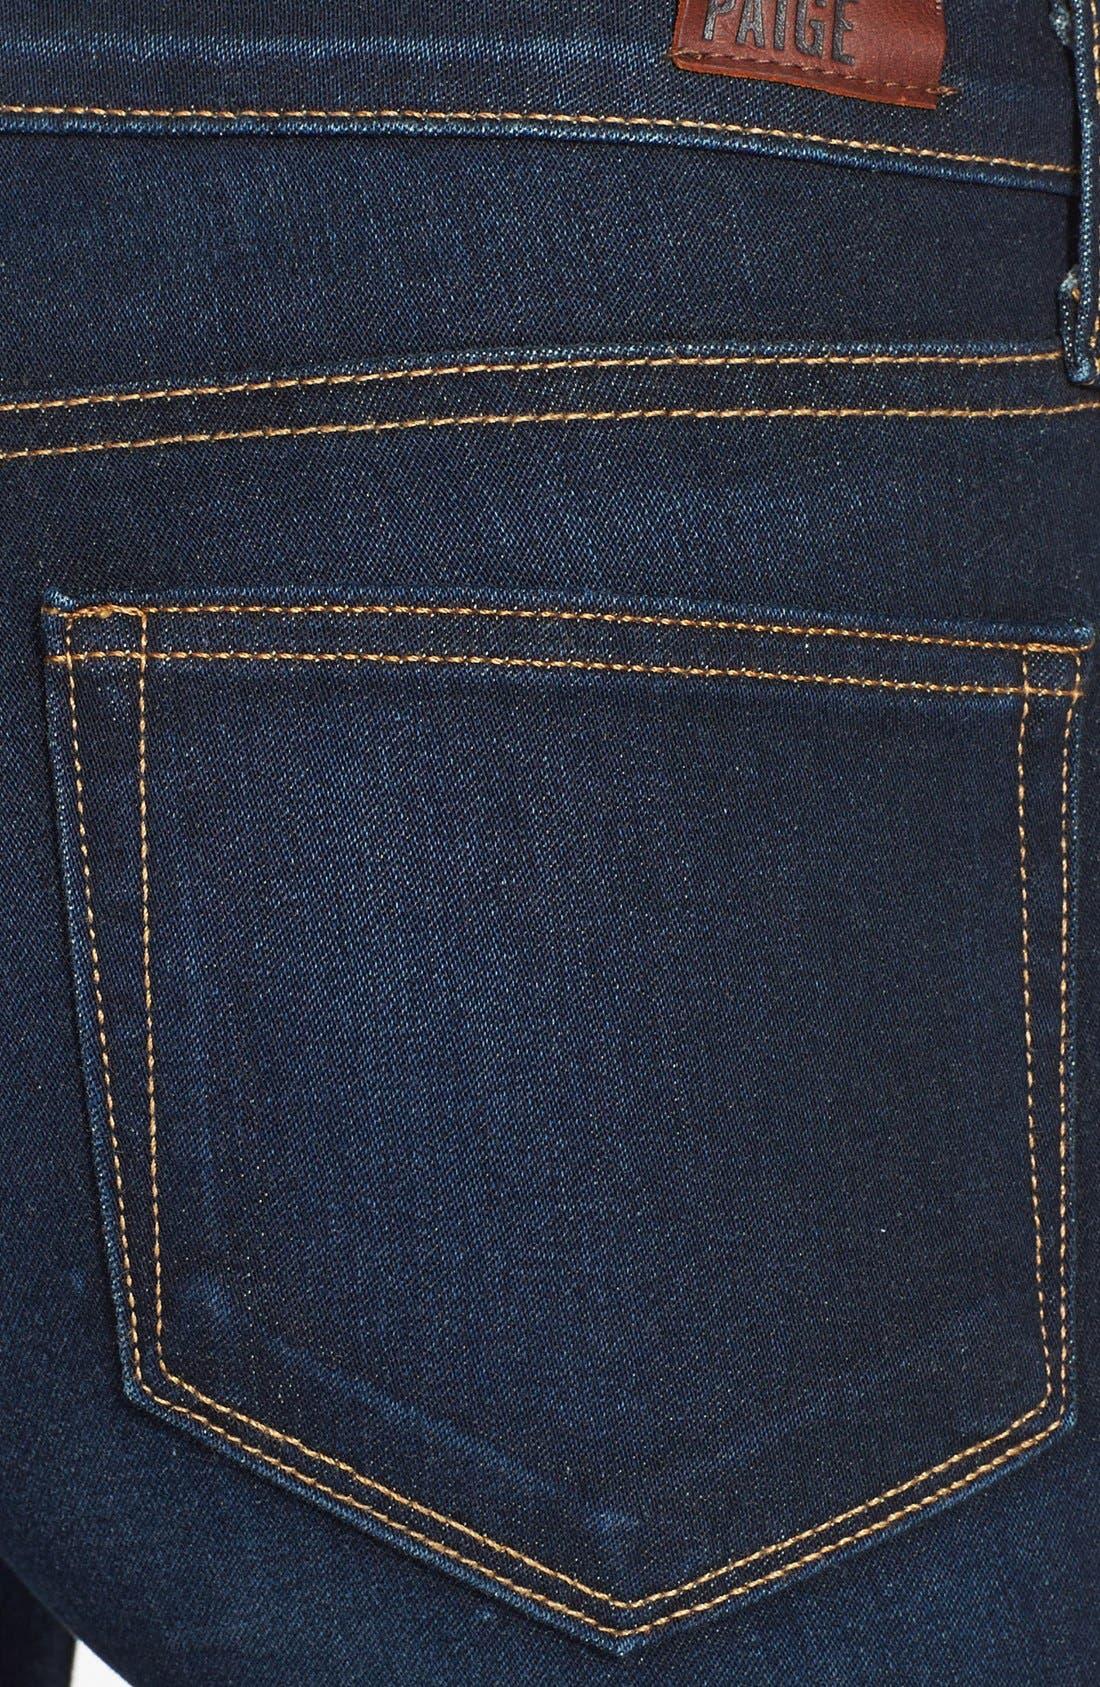 Alternate Image 3  - Paige Denim 'Verdugo' Ultra Skinny Jeans (Surface)